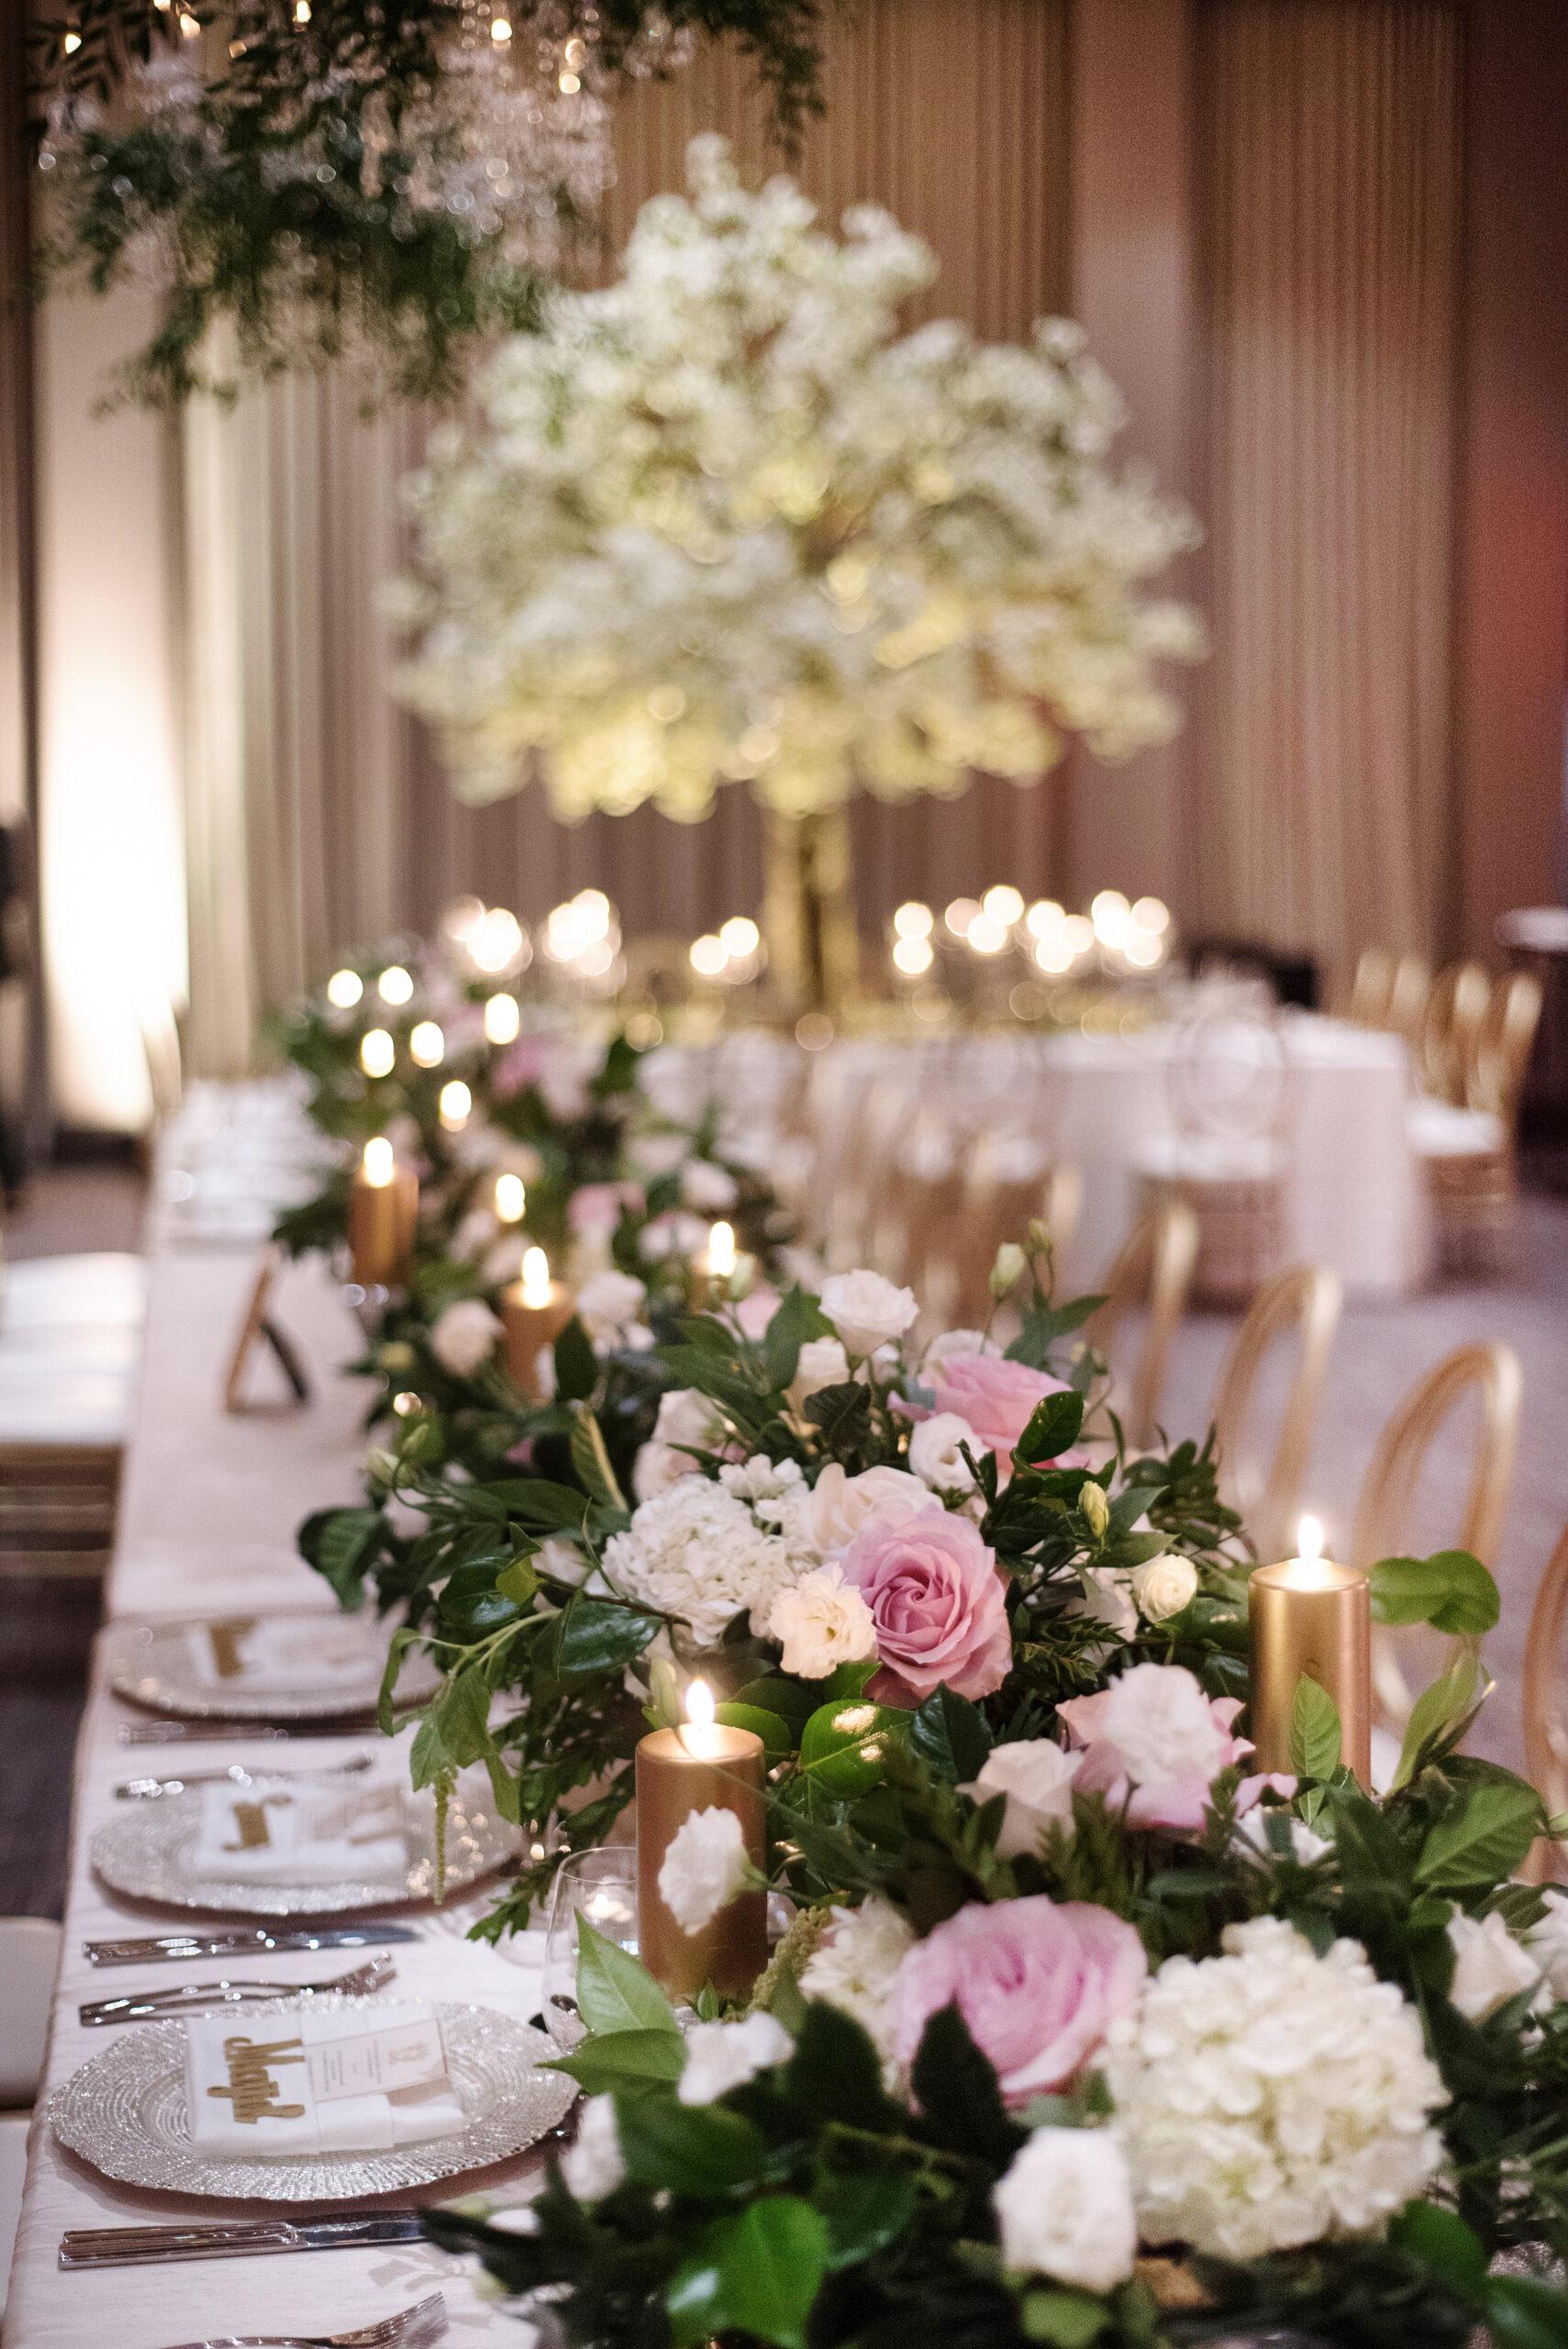 https://secureservercdn.net/45.40.145.151/kgq.ab5.myftpupload.com/wp-content/uploads/2020/04/Sanam-Soroush-s-Wedding-wedluxe-submission-0091-scaled.jpg?time=1600462602